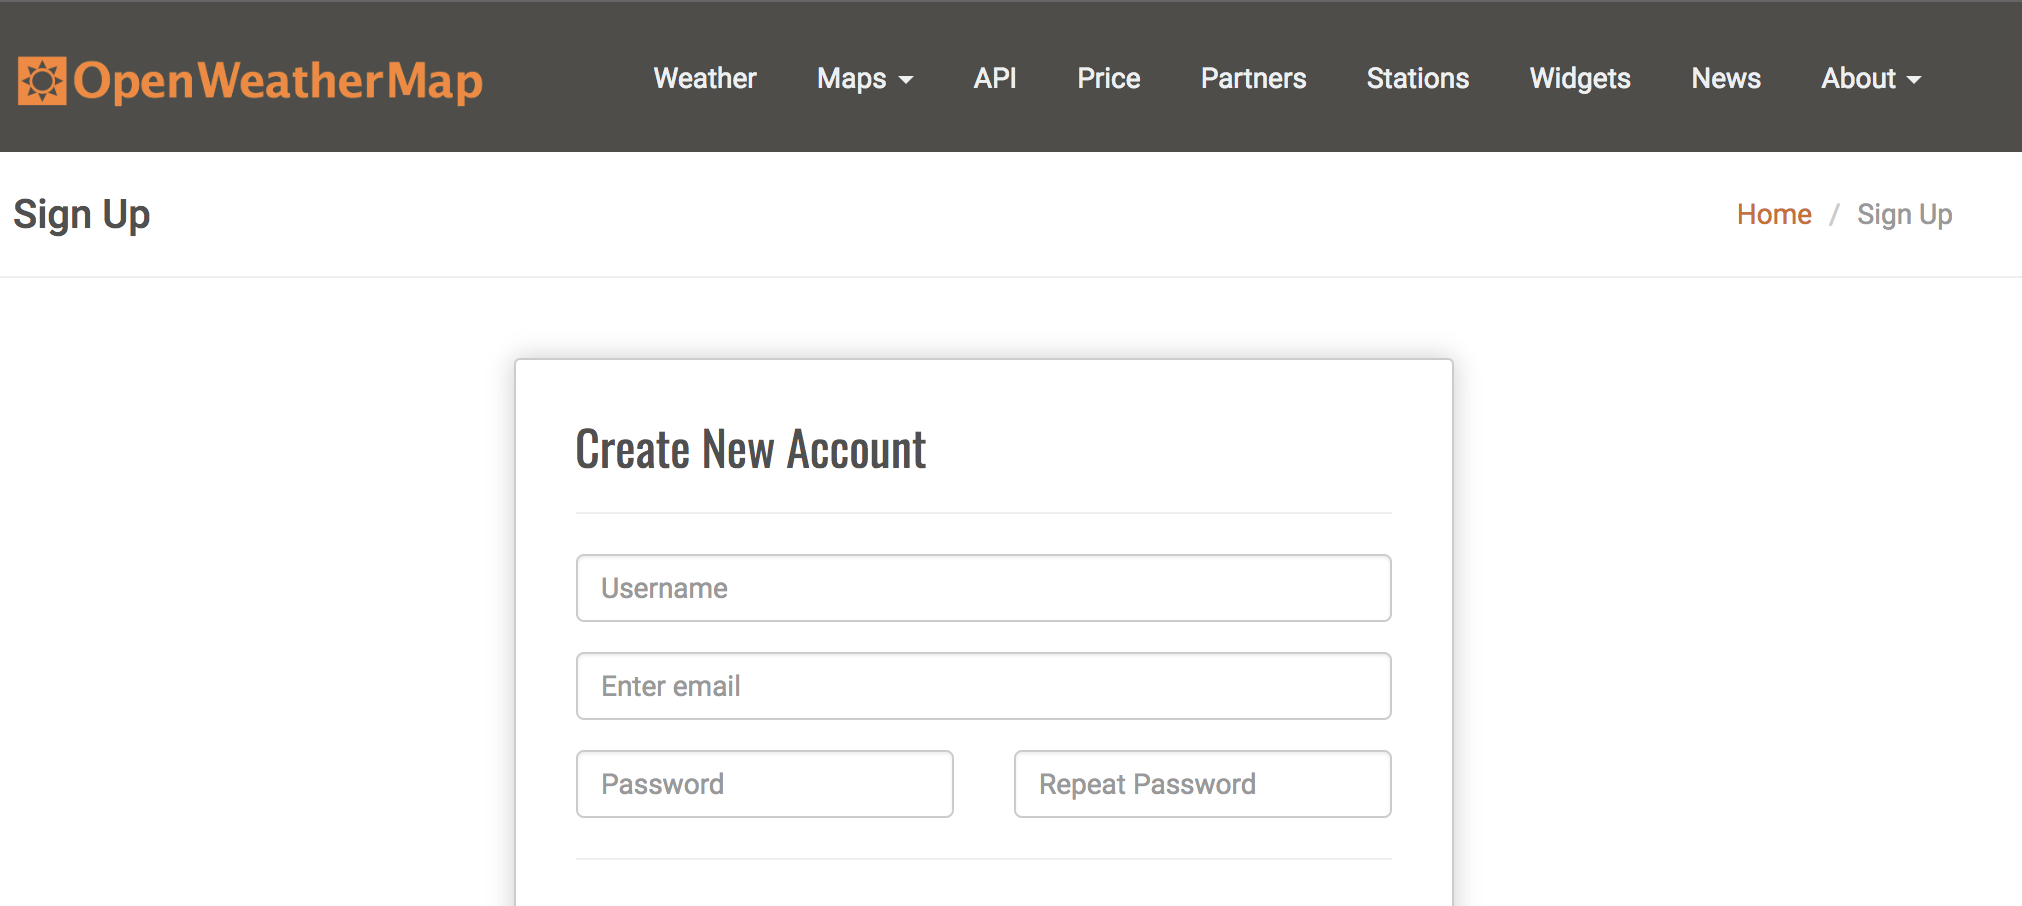 OpenWeatherMap API Signup Form